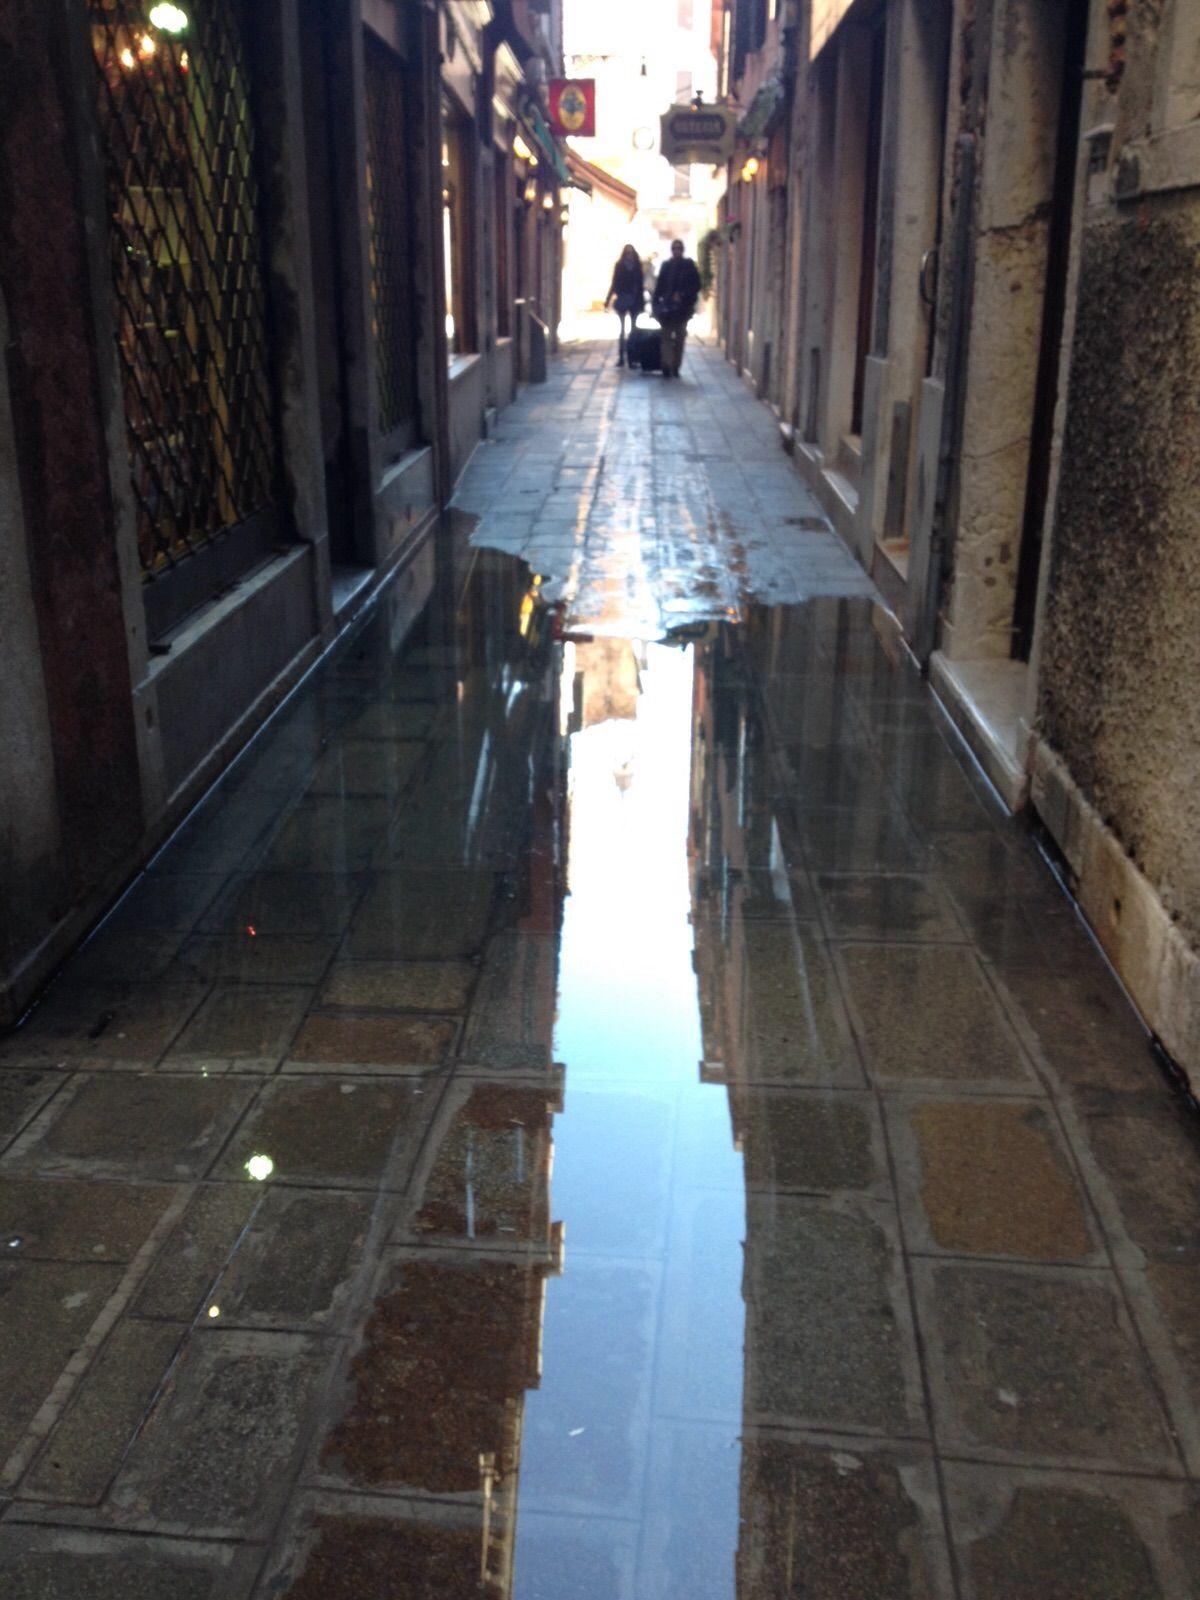 Wateroverlast in Venetië (27 november 2015). ©2015 Sofia J. Lirb.